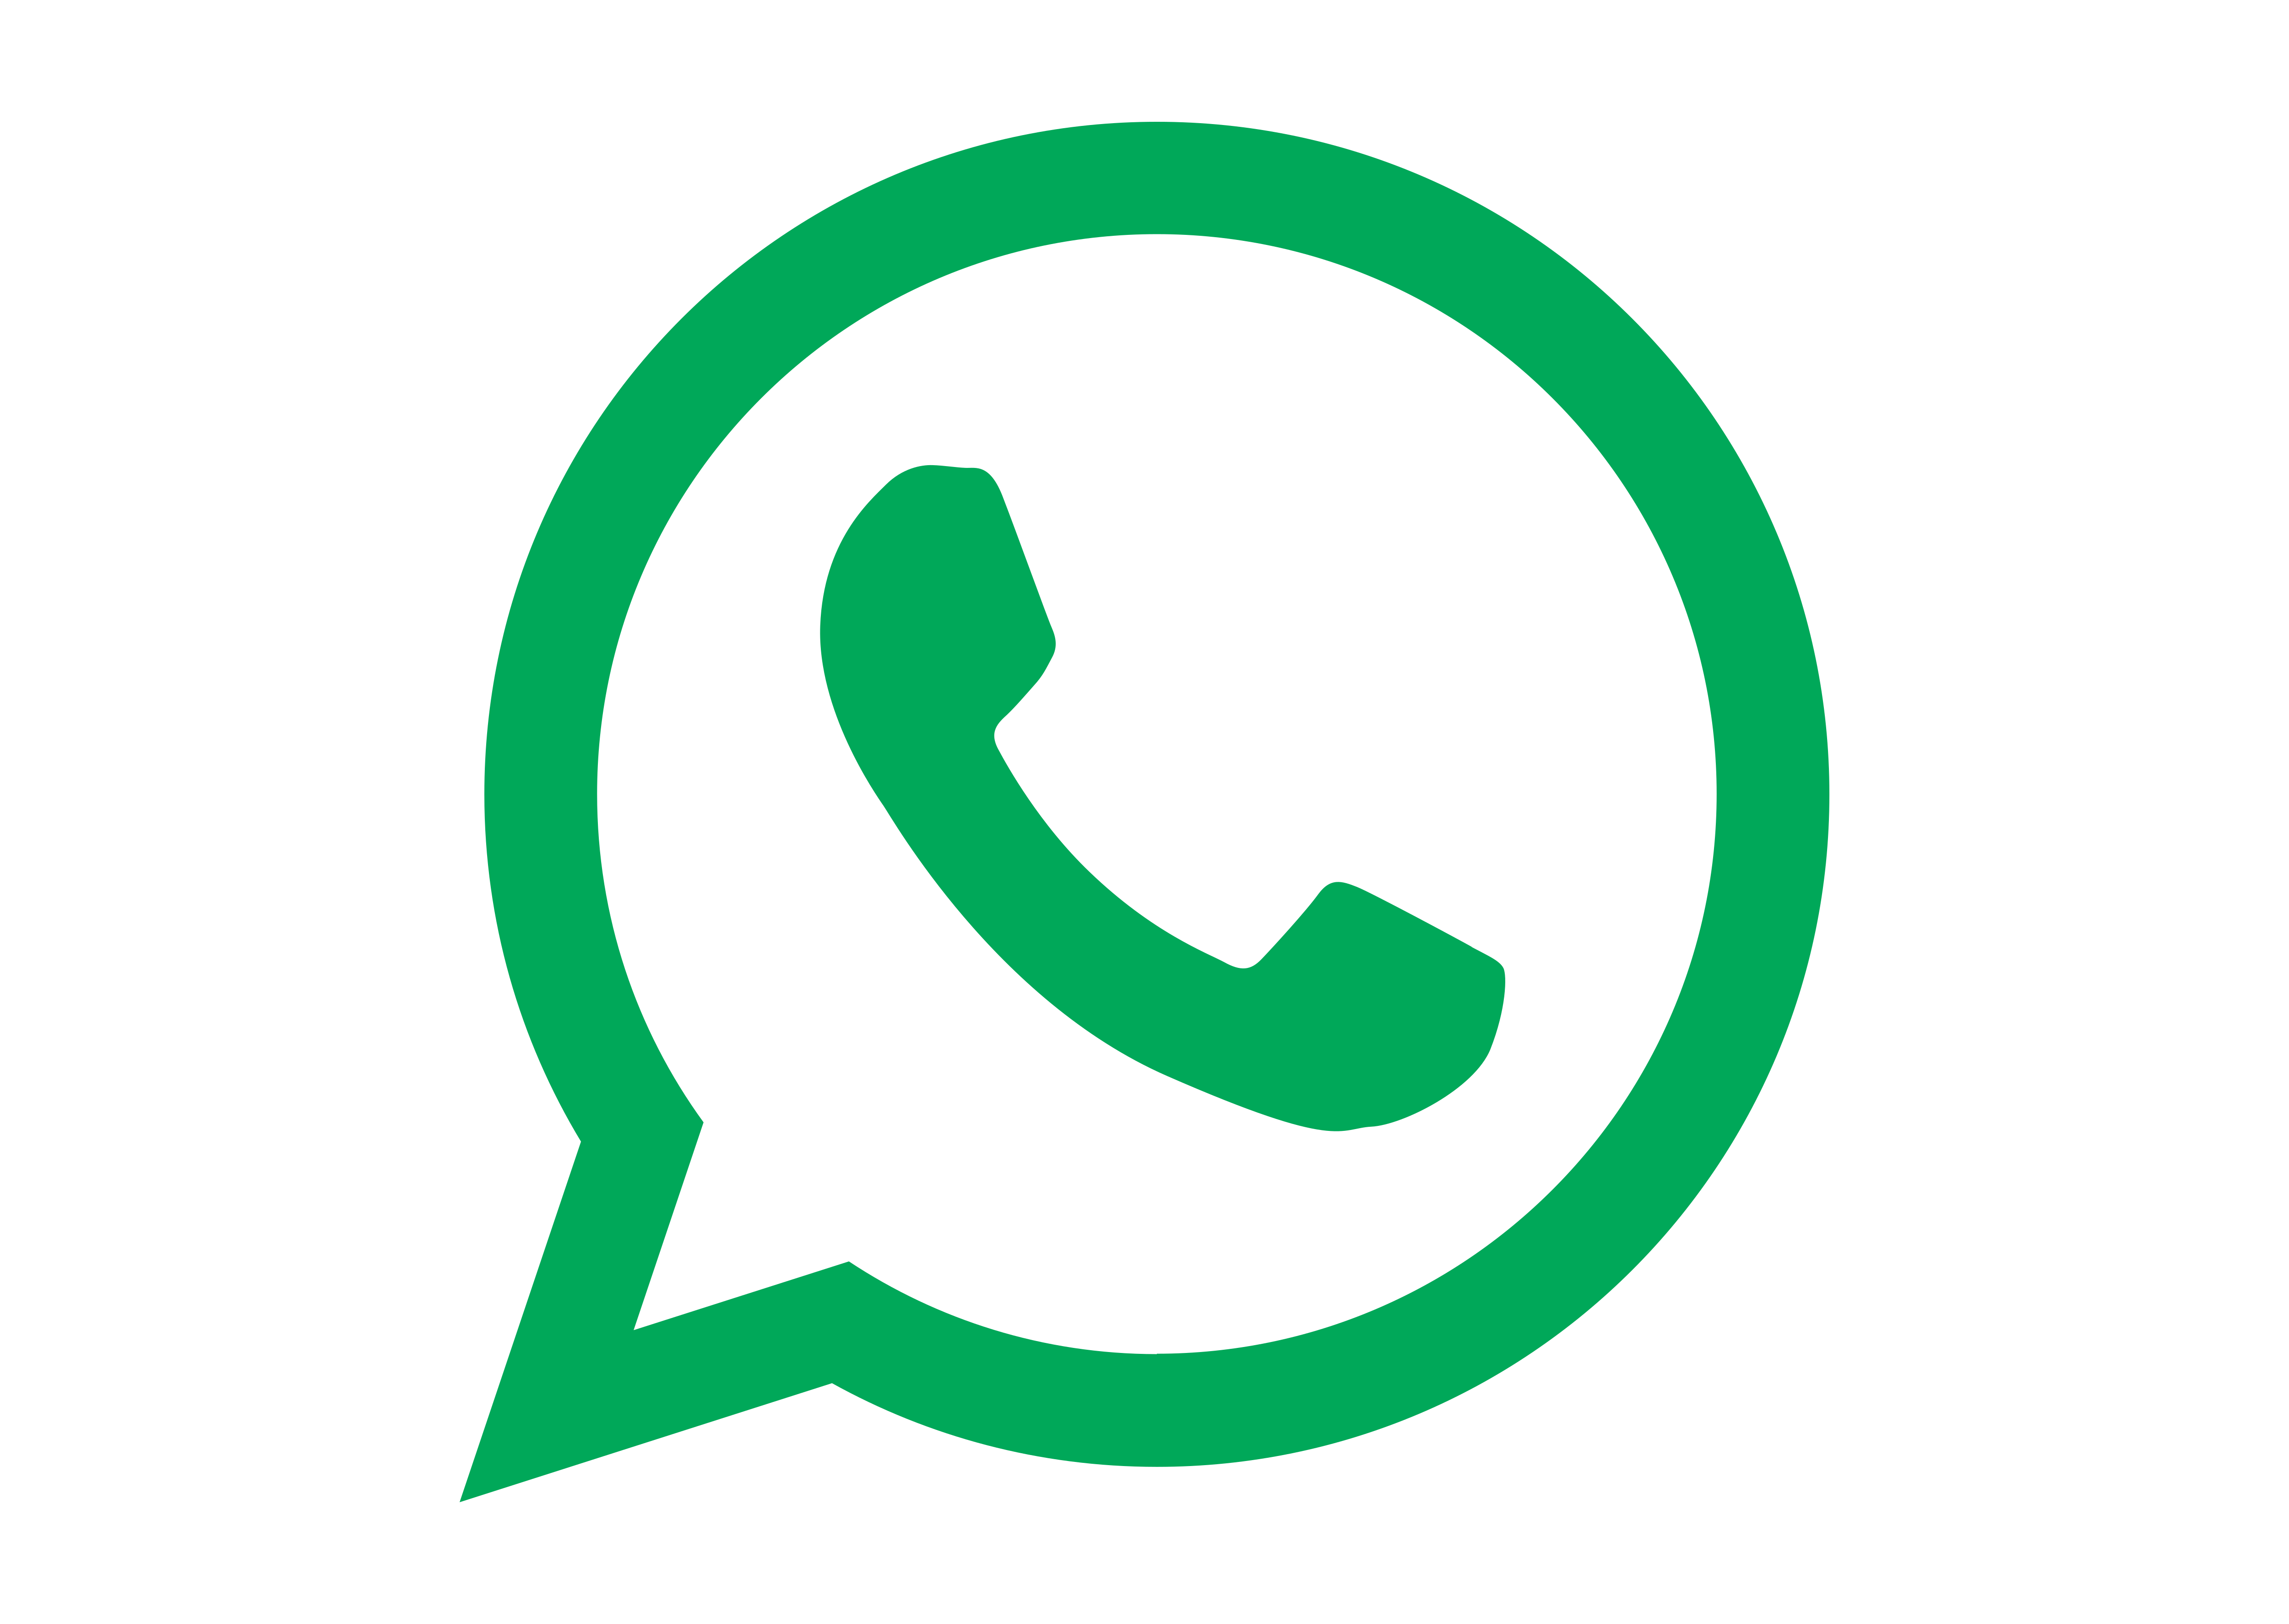 Whatsapp logo vetor - Whatsapp Logo